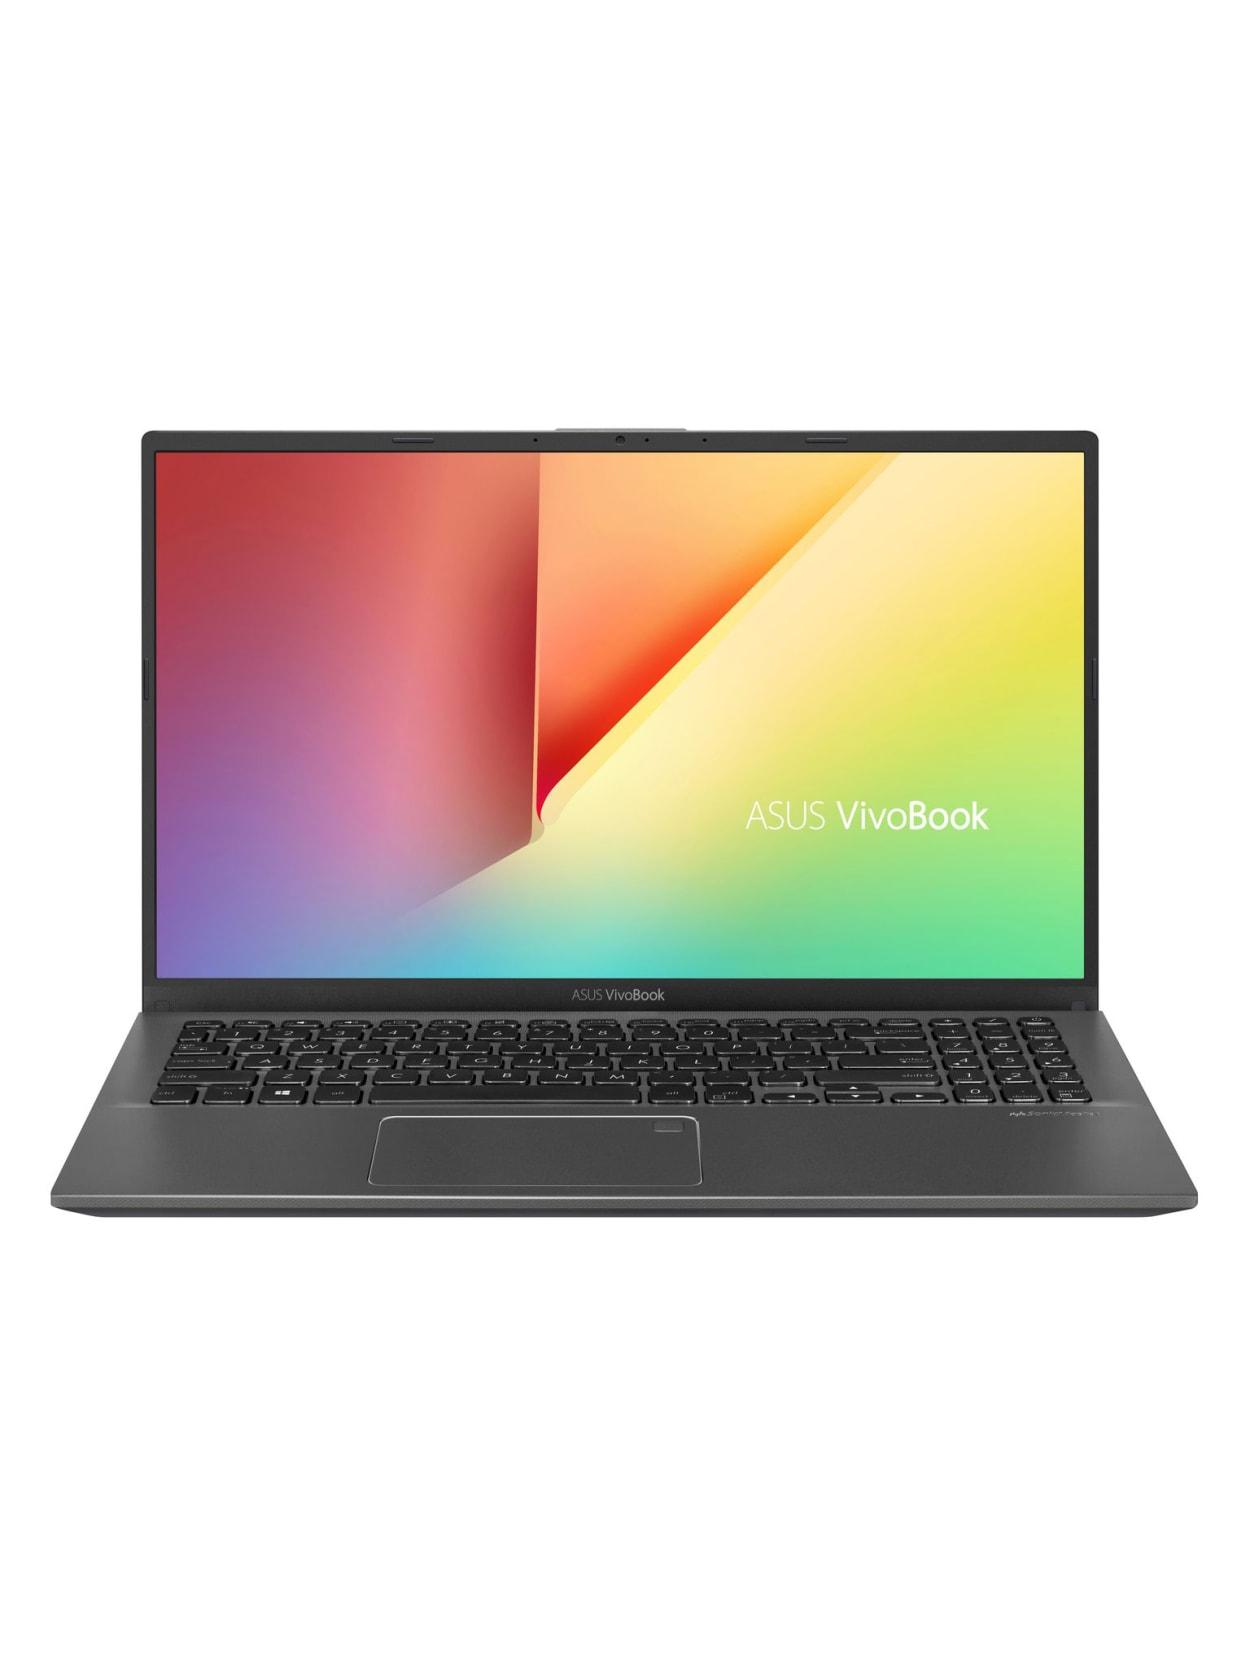 Asus Vivobook F512ja Oh71 15 6 Laptop Office Depot